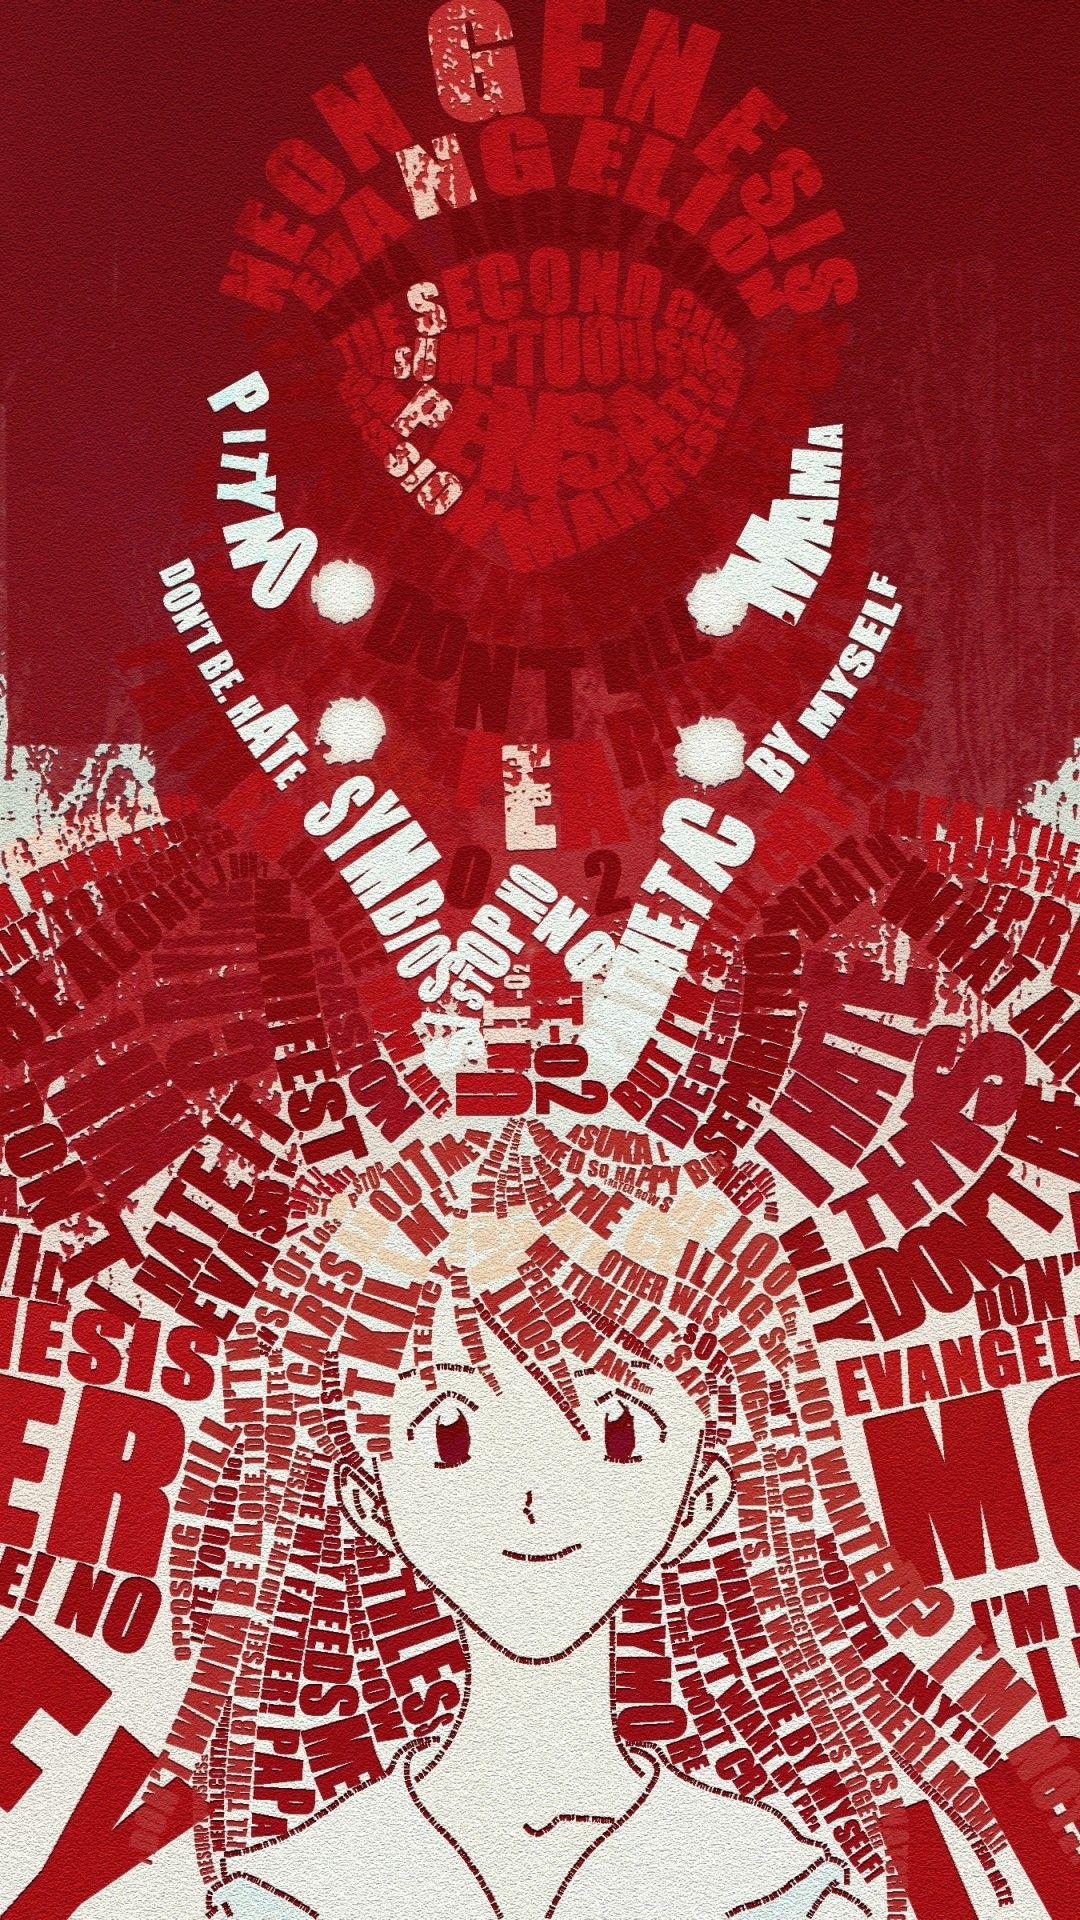 Evangelion Phone Wallpaper 63 images Wallpaper de anime Anime 1080x1920